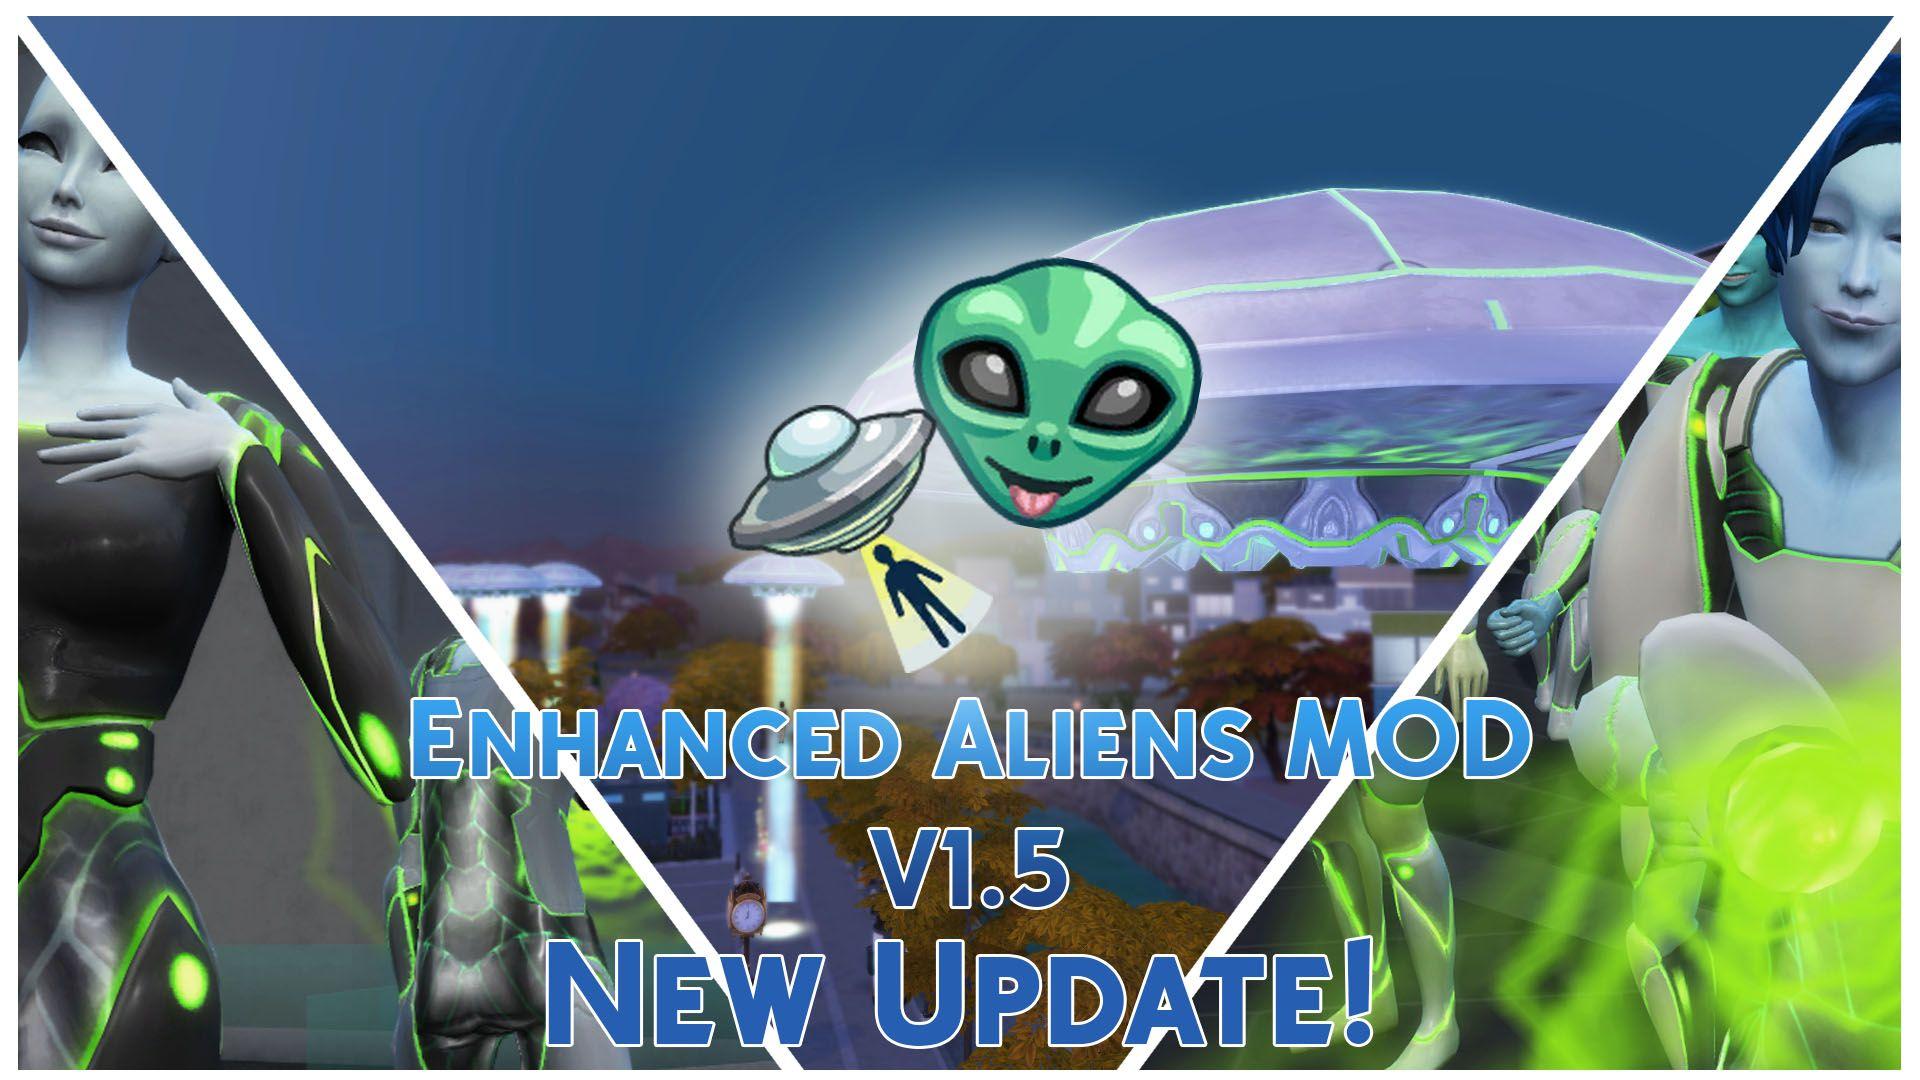 Mod The Sims - Enhanced Aliens Mod V1 5 [UPDATED 29/08/2018